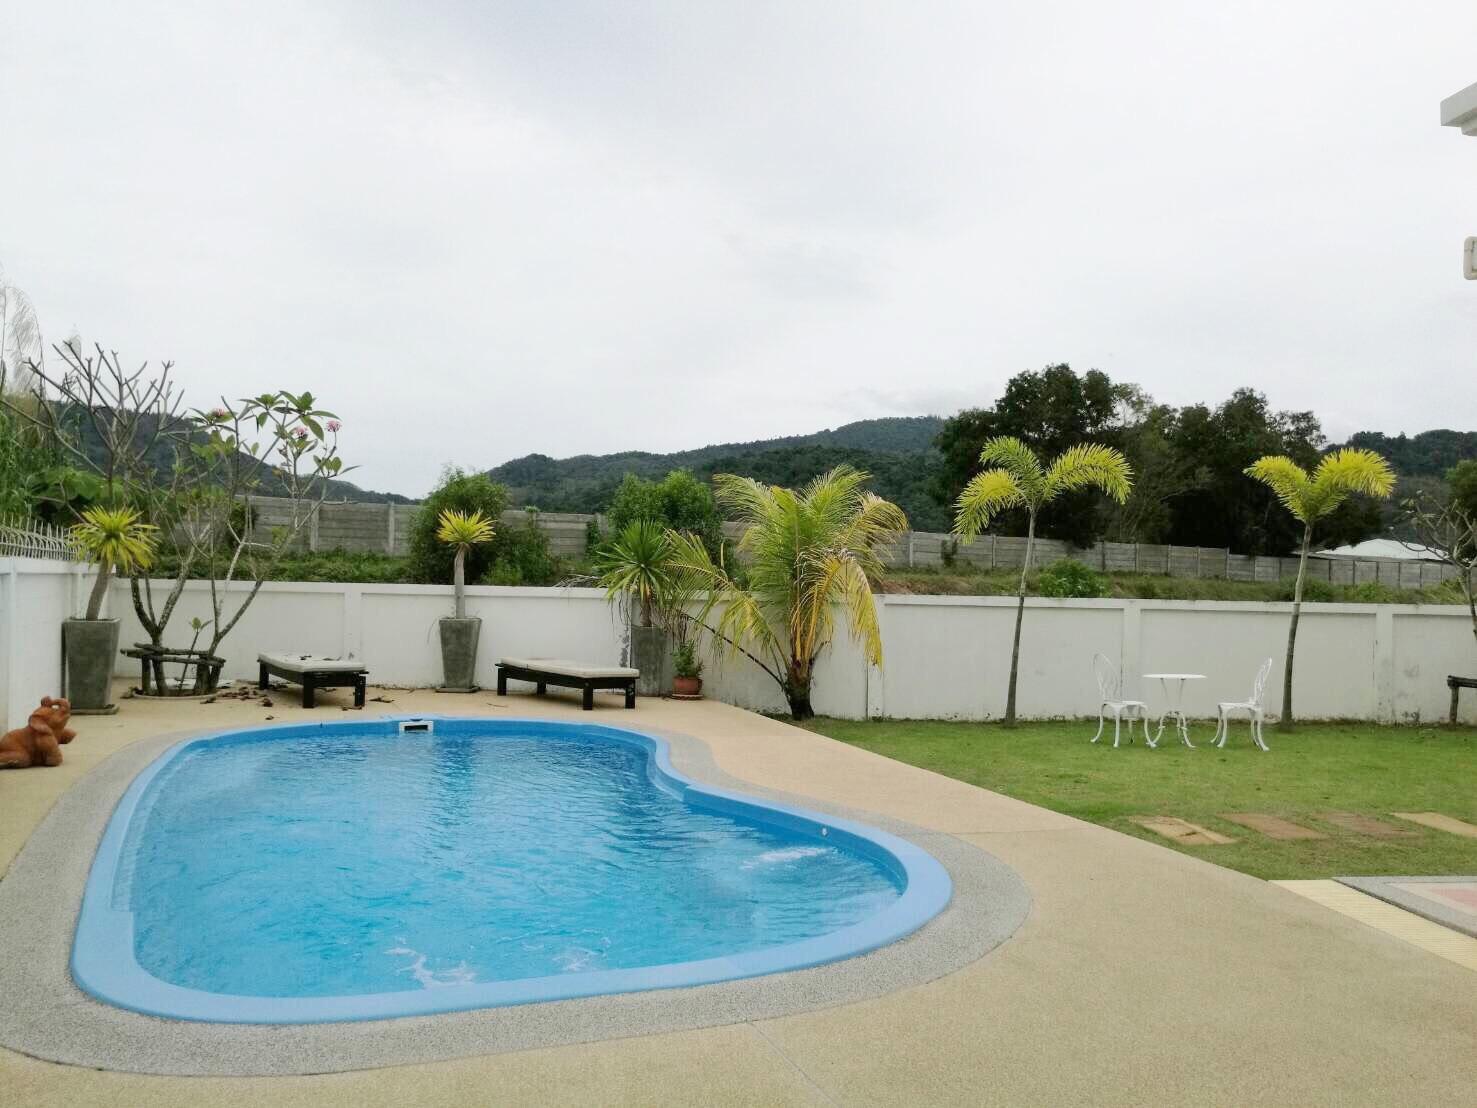 Pool Villa 4 Bedrooms for Long Term Rent